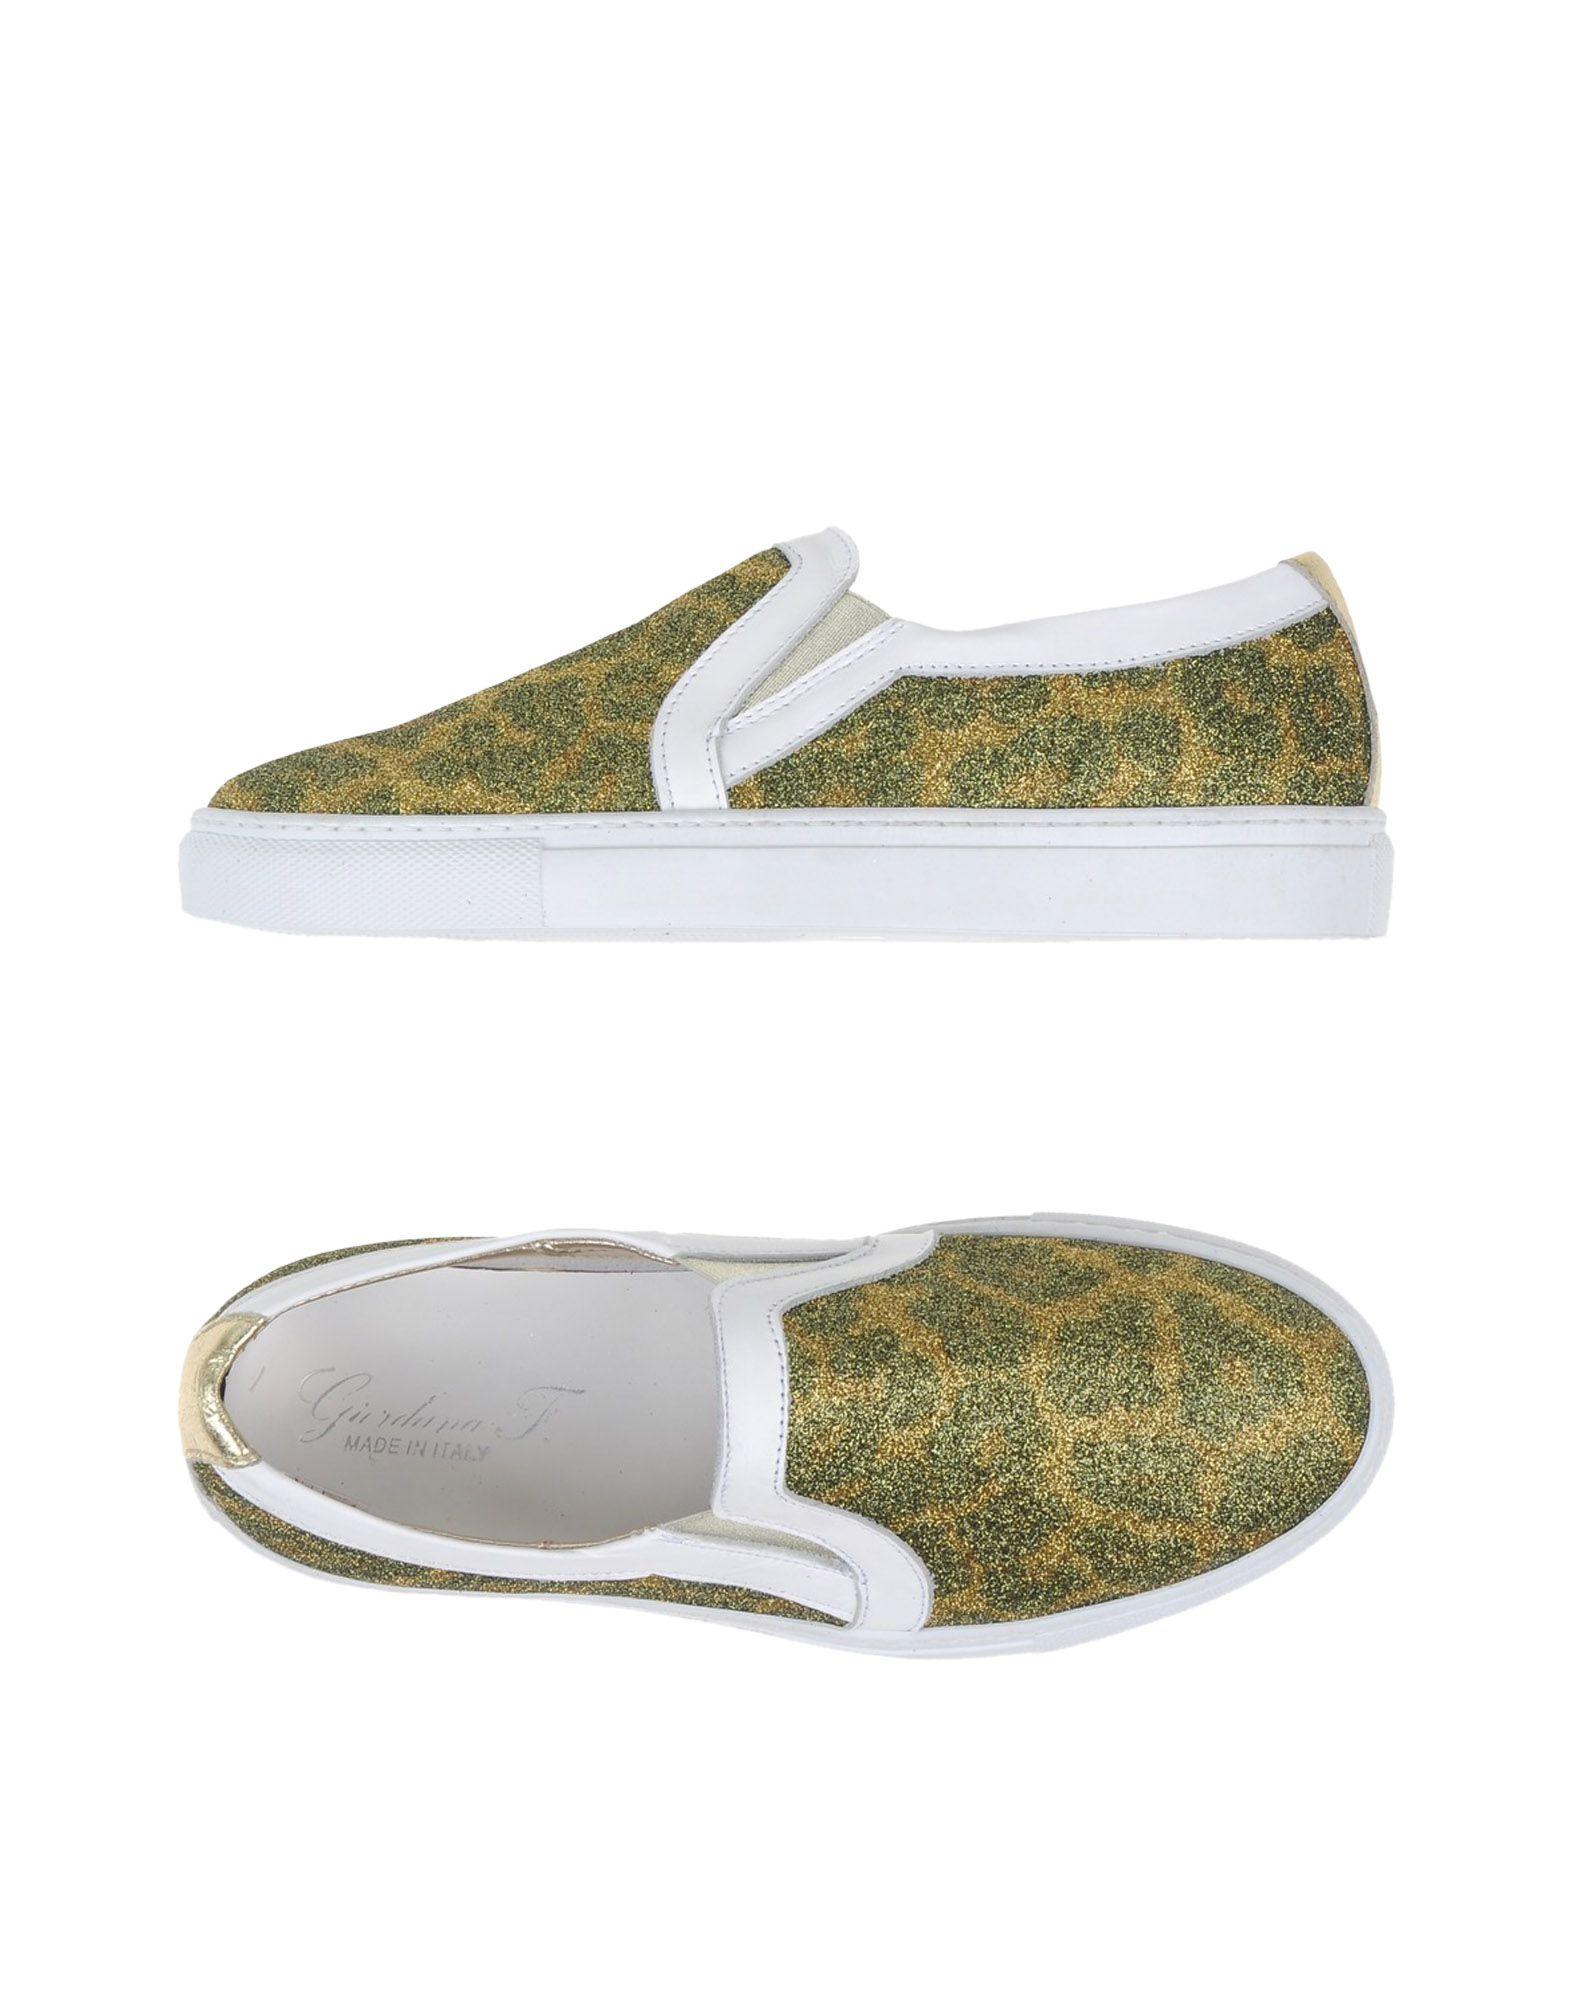 Sneakers Giordana F. Femme - Sneakers Giordana F. sur